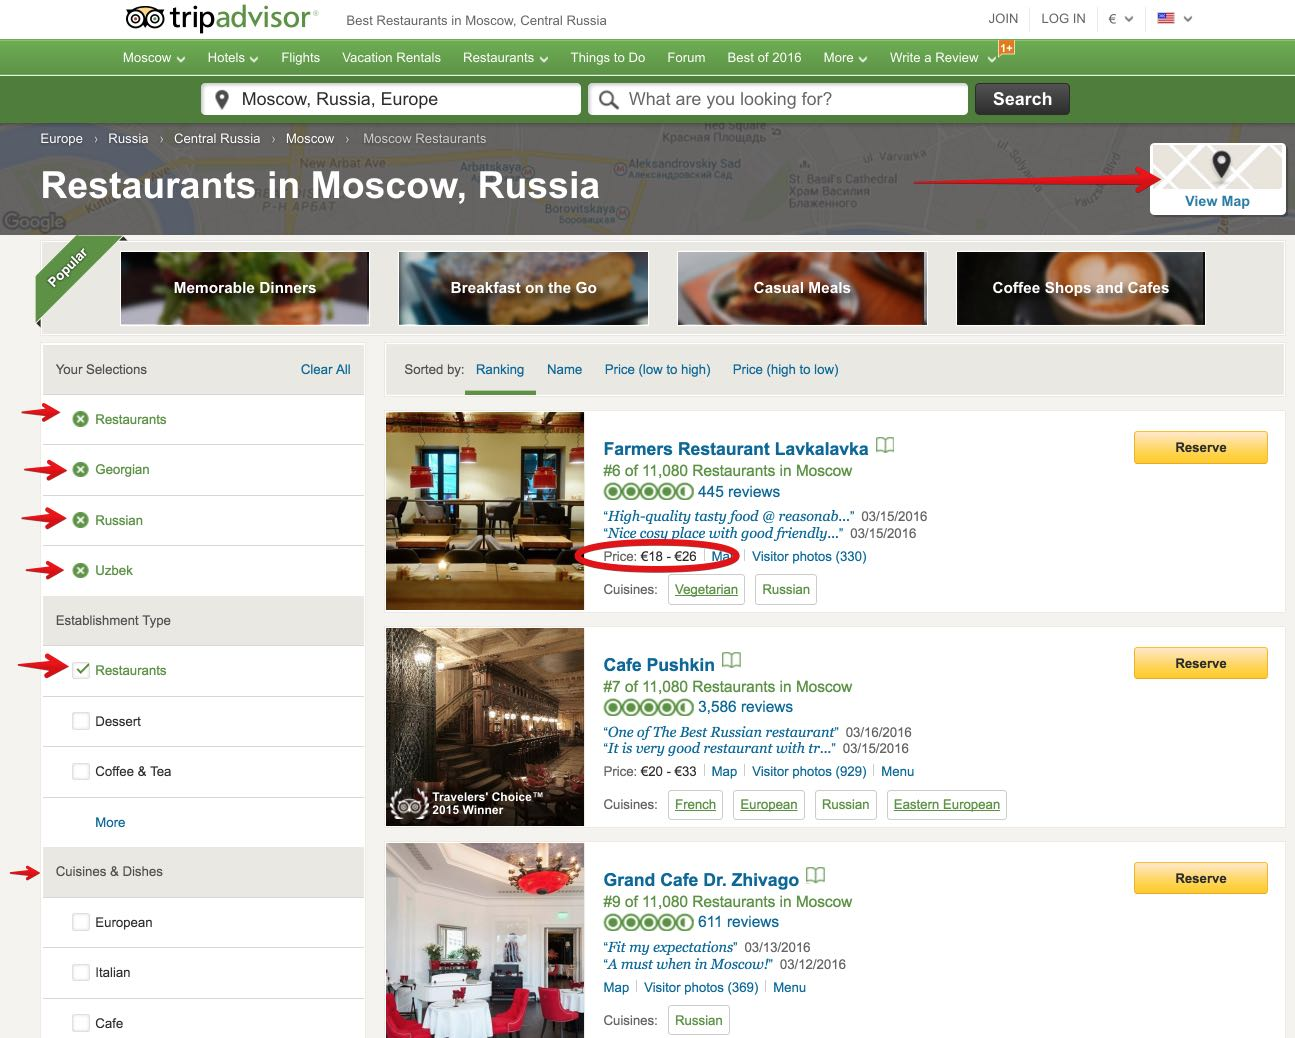 I migliori ristoranti di Mosca - Tripadvisor